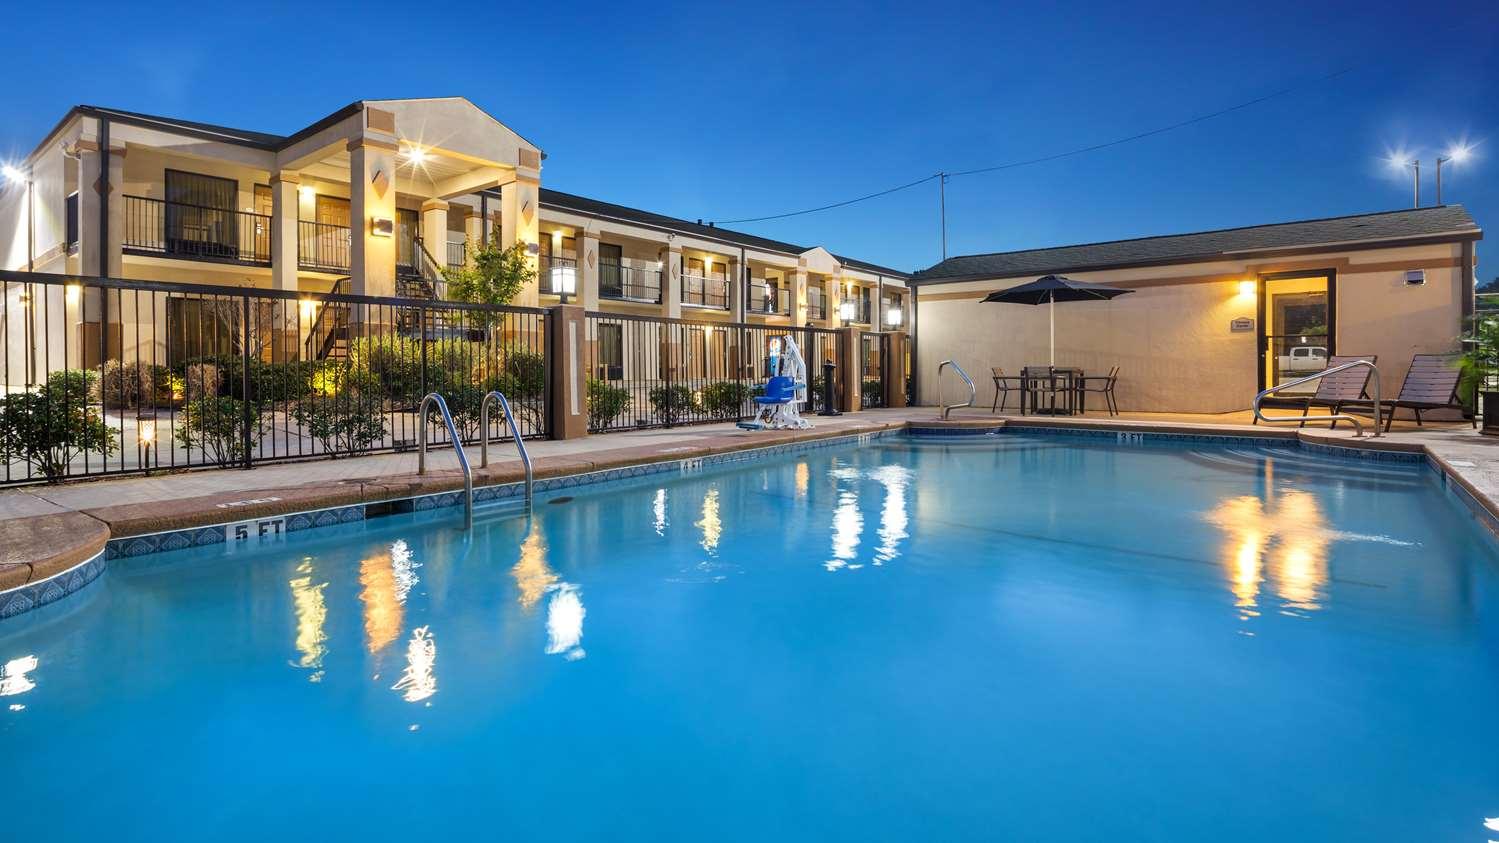 Pool - Best Western Inn Monroeville